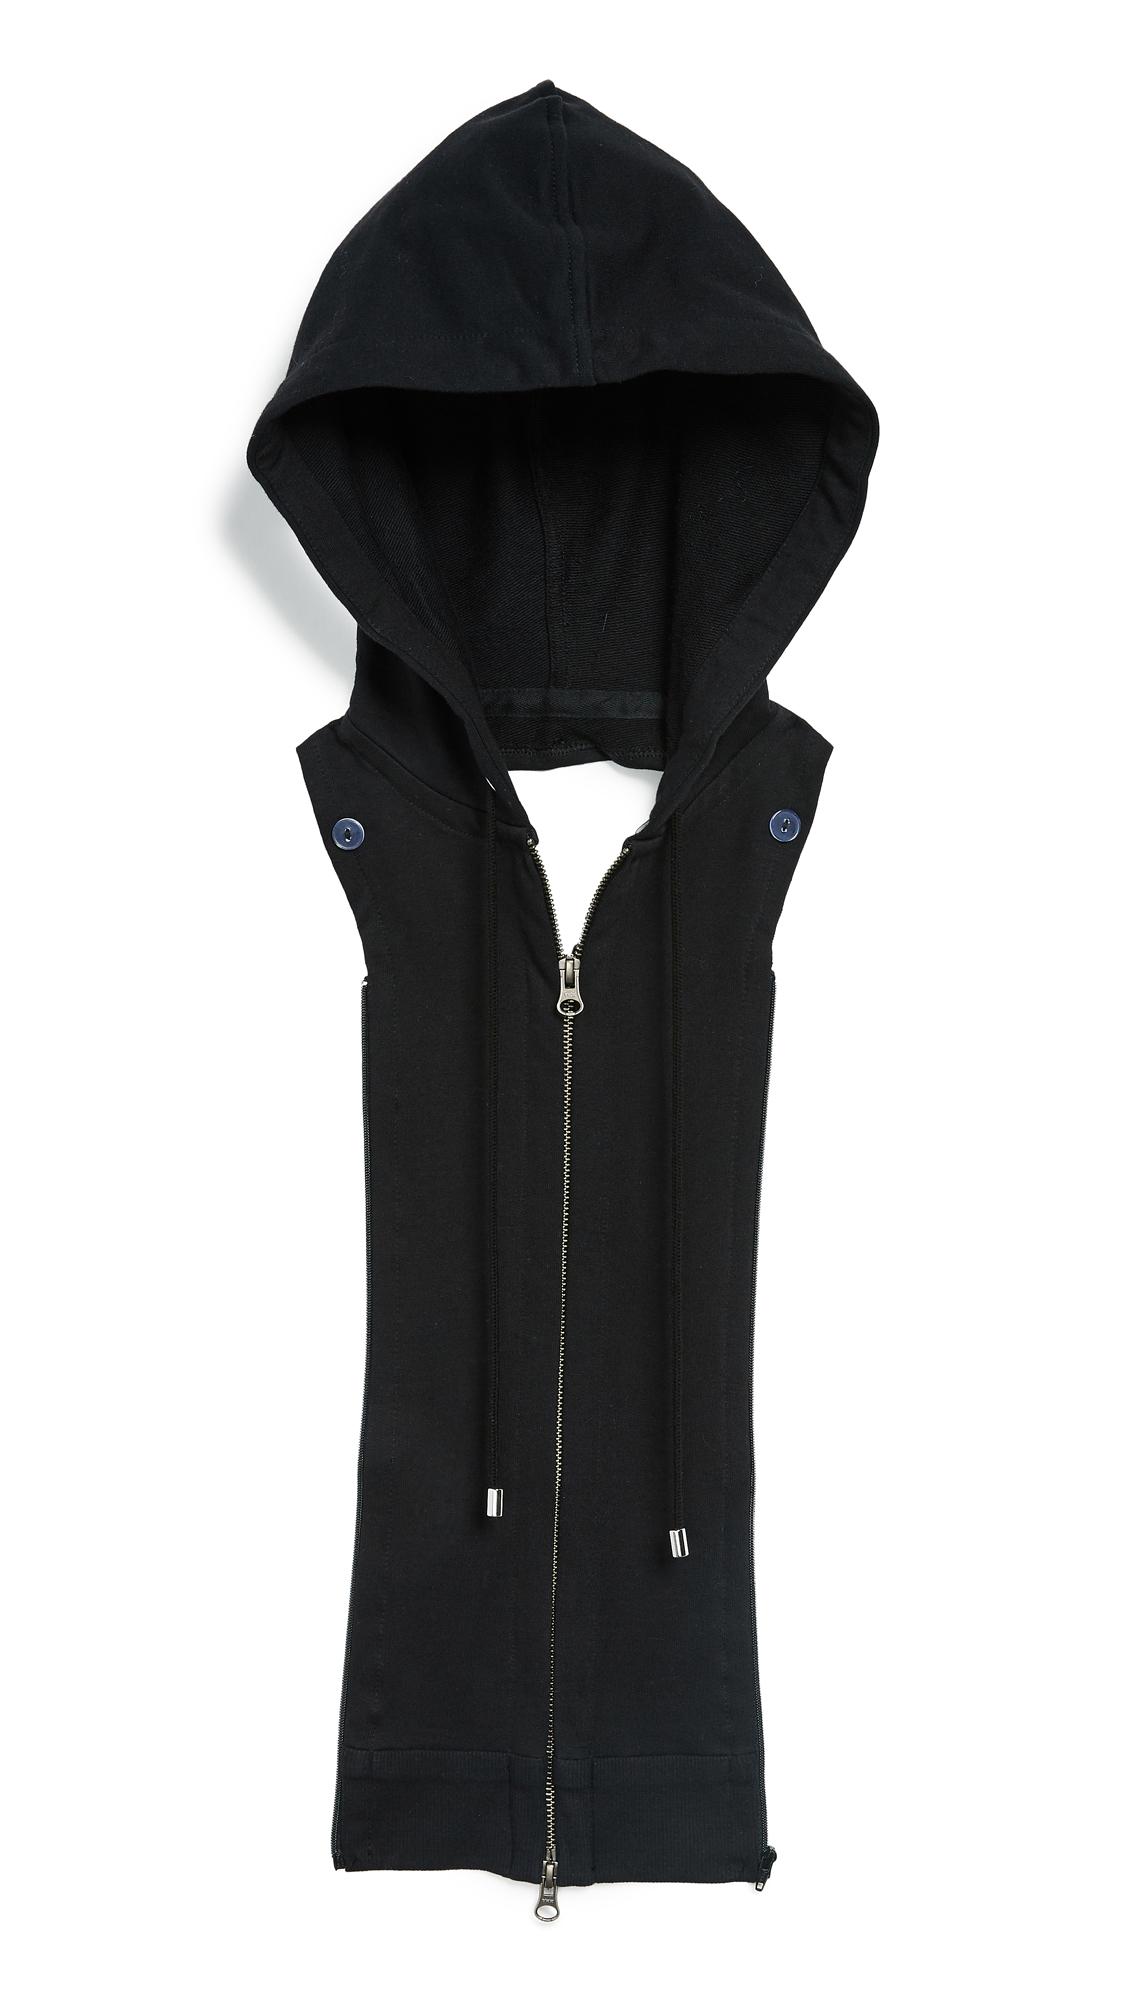 Buy Veronica Beard Hoodie Dickey online beautiful Veronica Beard Jackets, Coats, Coats